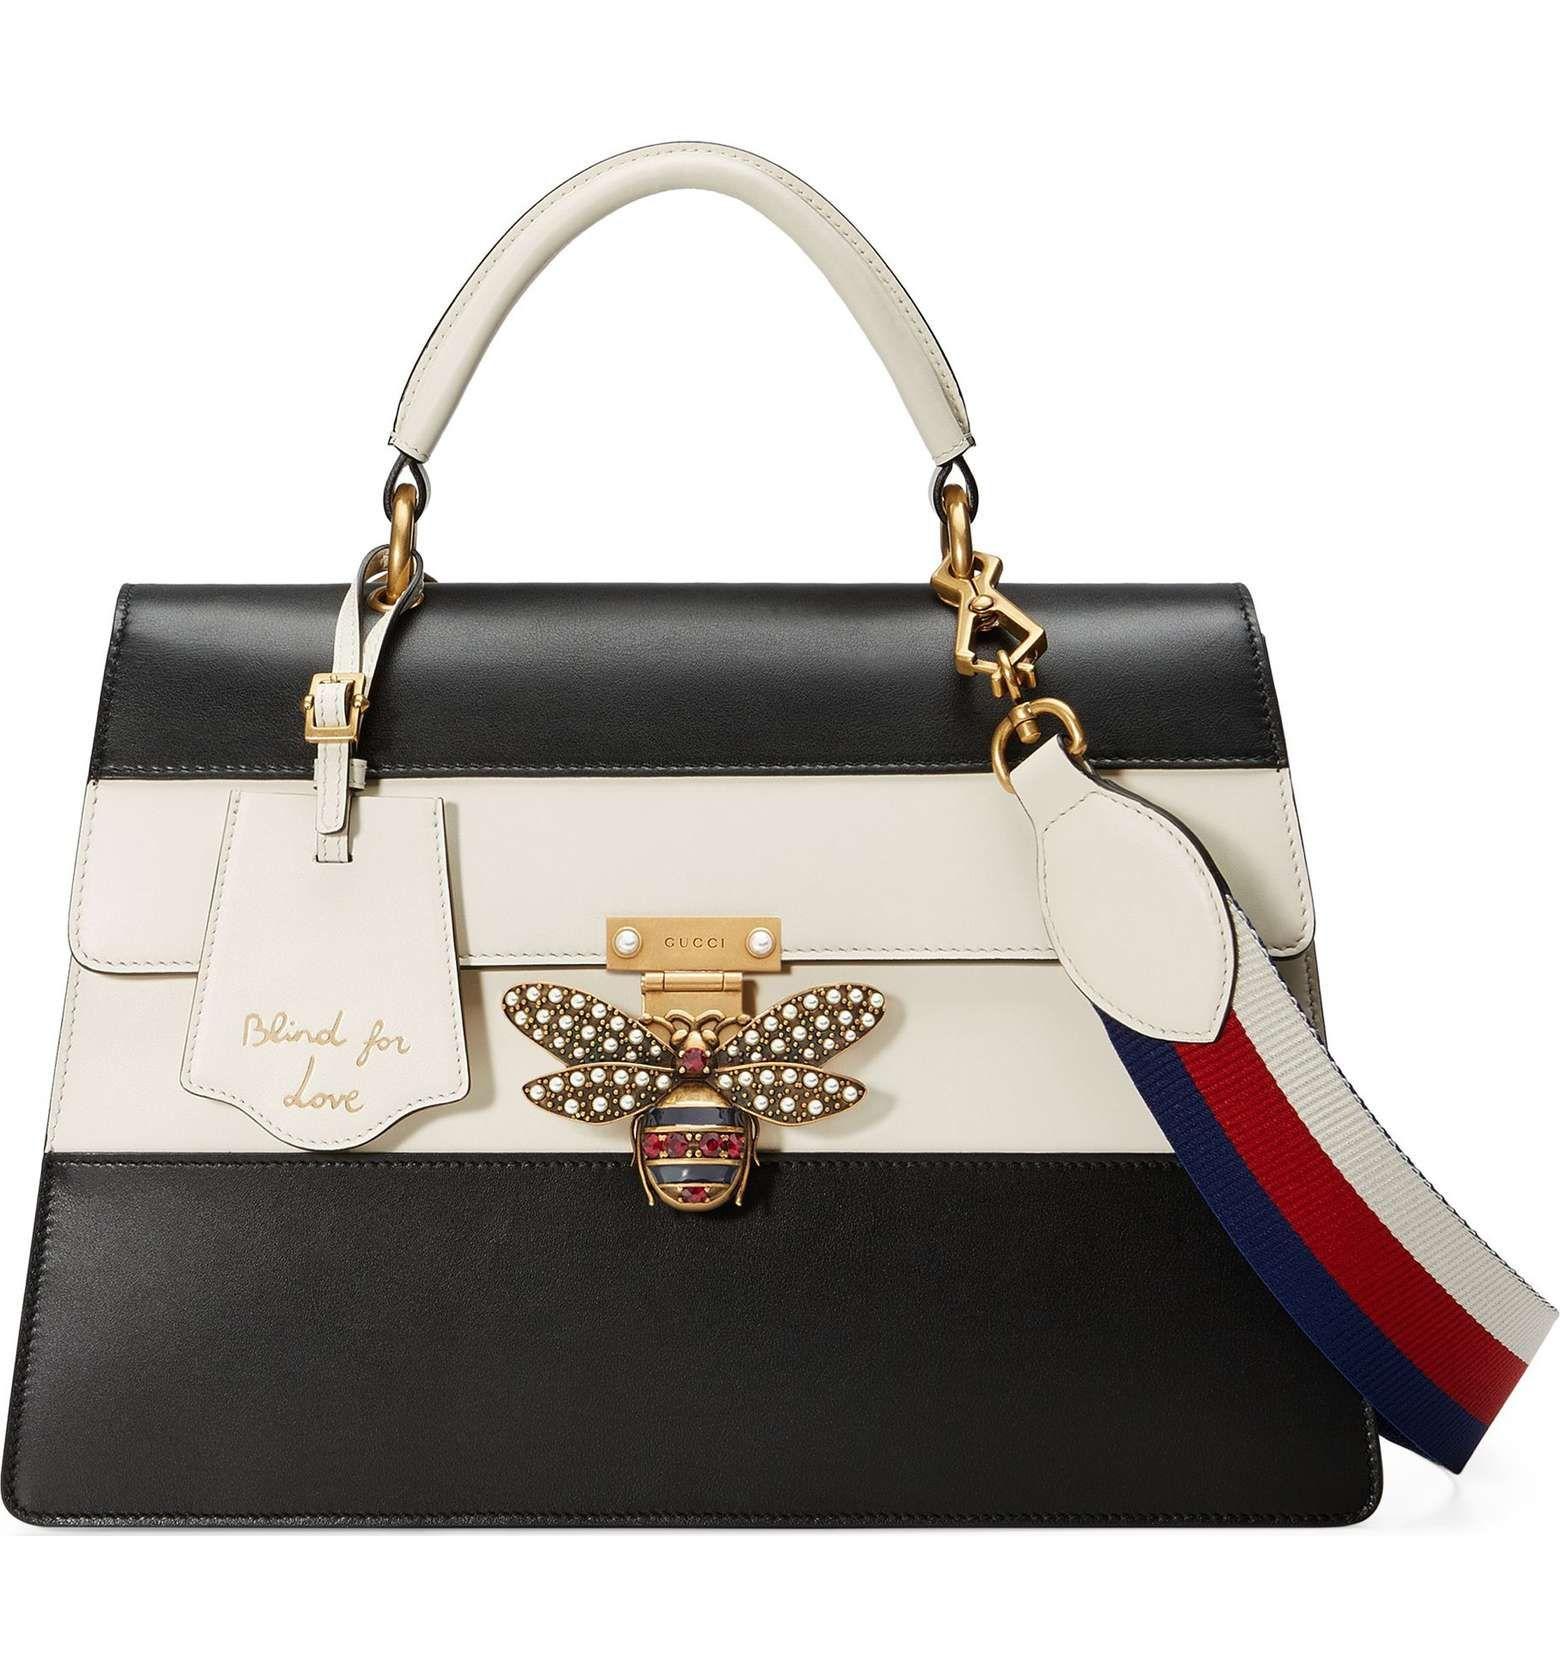 dc32923aa3e3 Main Image - Gucci Queen Margaret Top Handle Leather Satchel ...